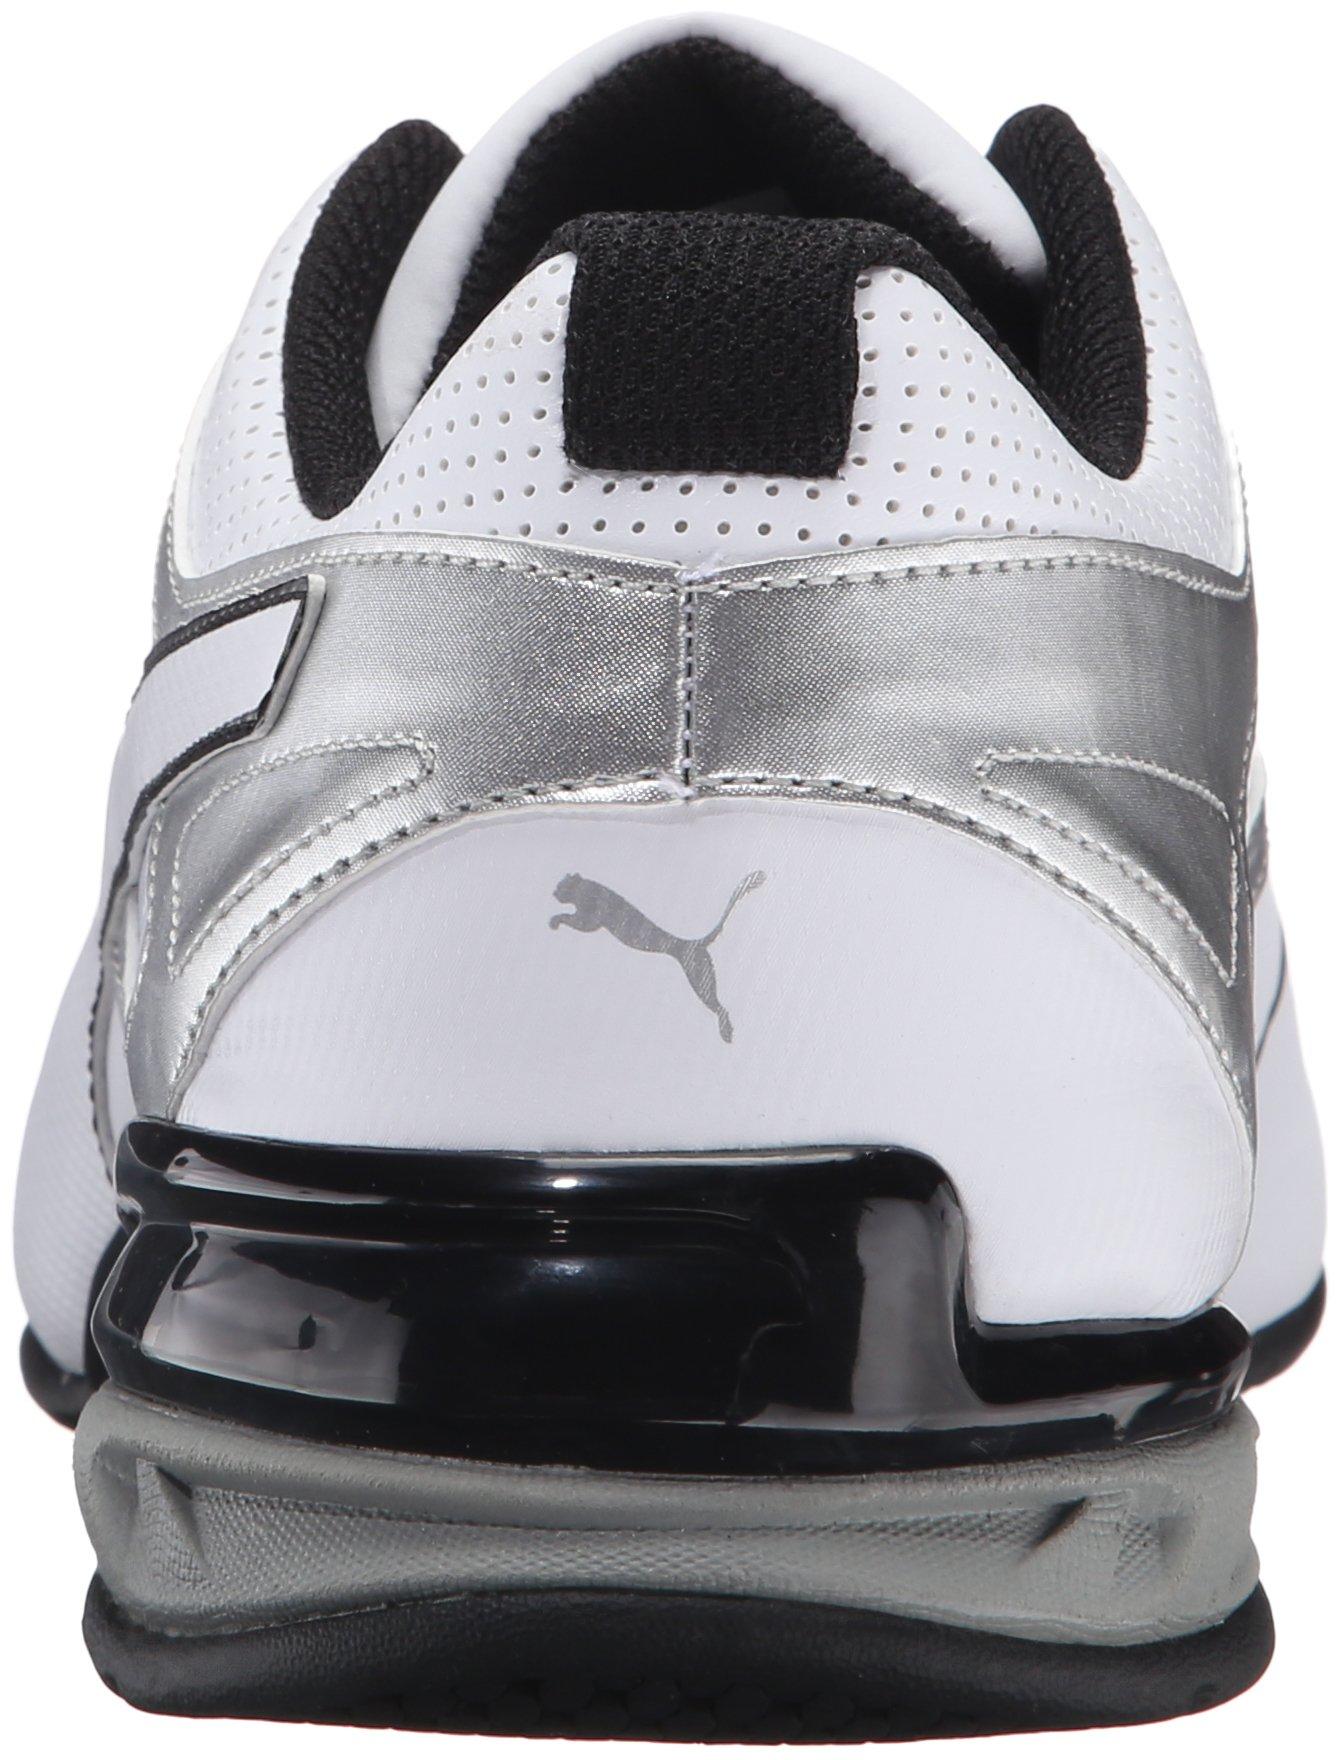 PUMA Men's Tazon 6 FM Puma White/ Puma Silver Running Shoe - 7.5 D(M) US by PUMA (Image #2)